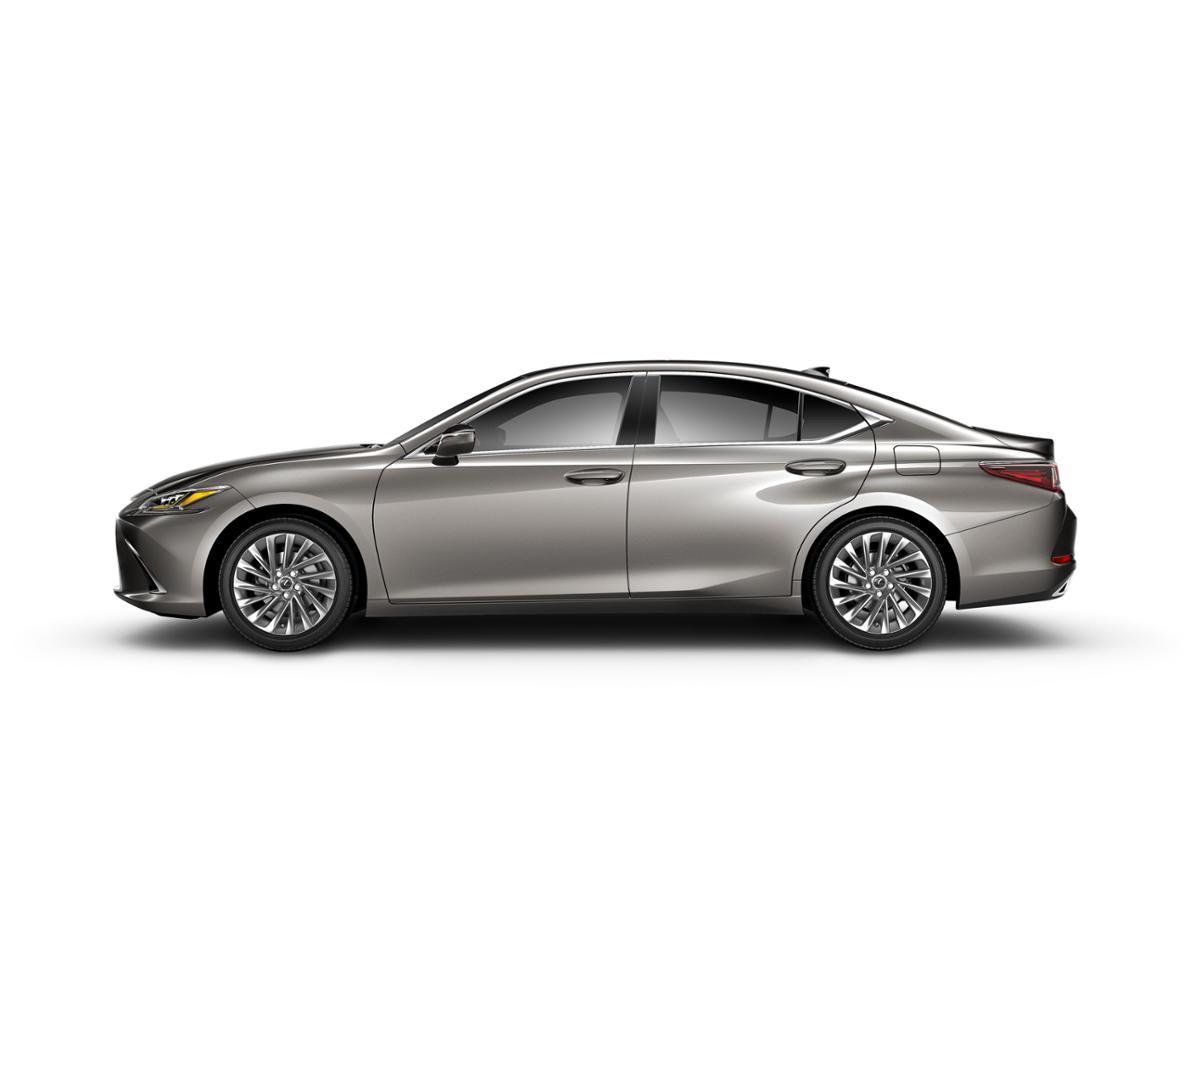 Henderson Atomic Silver 2019 Lexus ES 350: New Car For